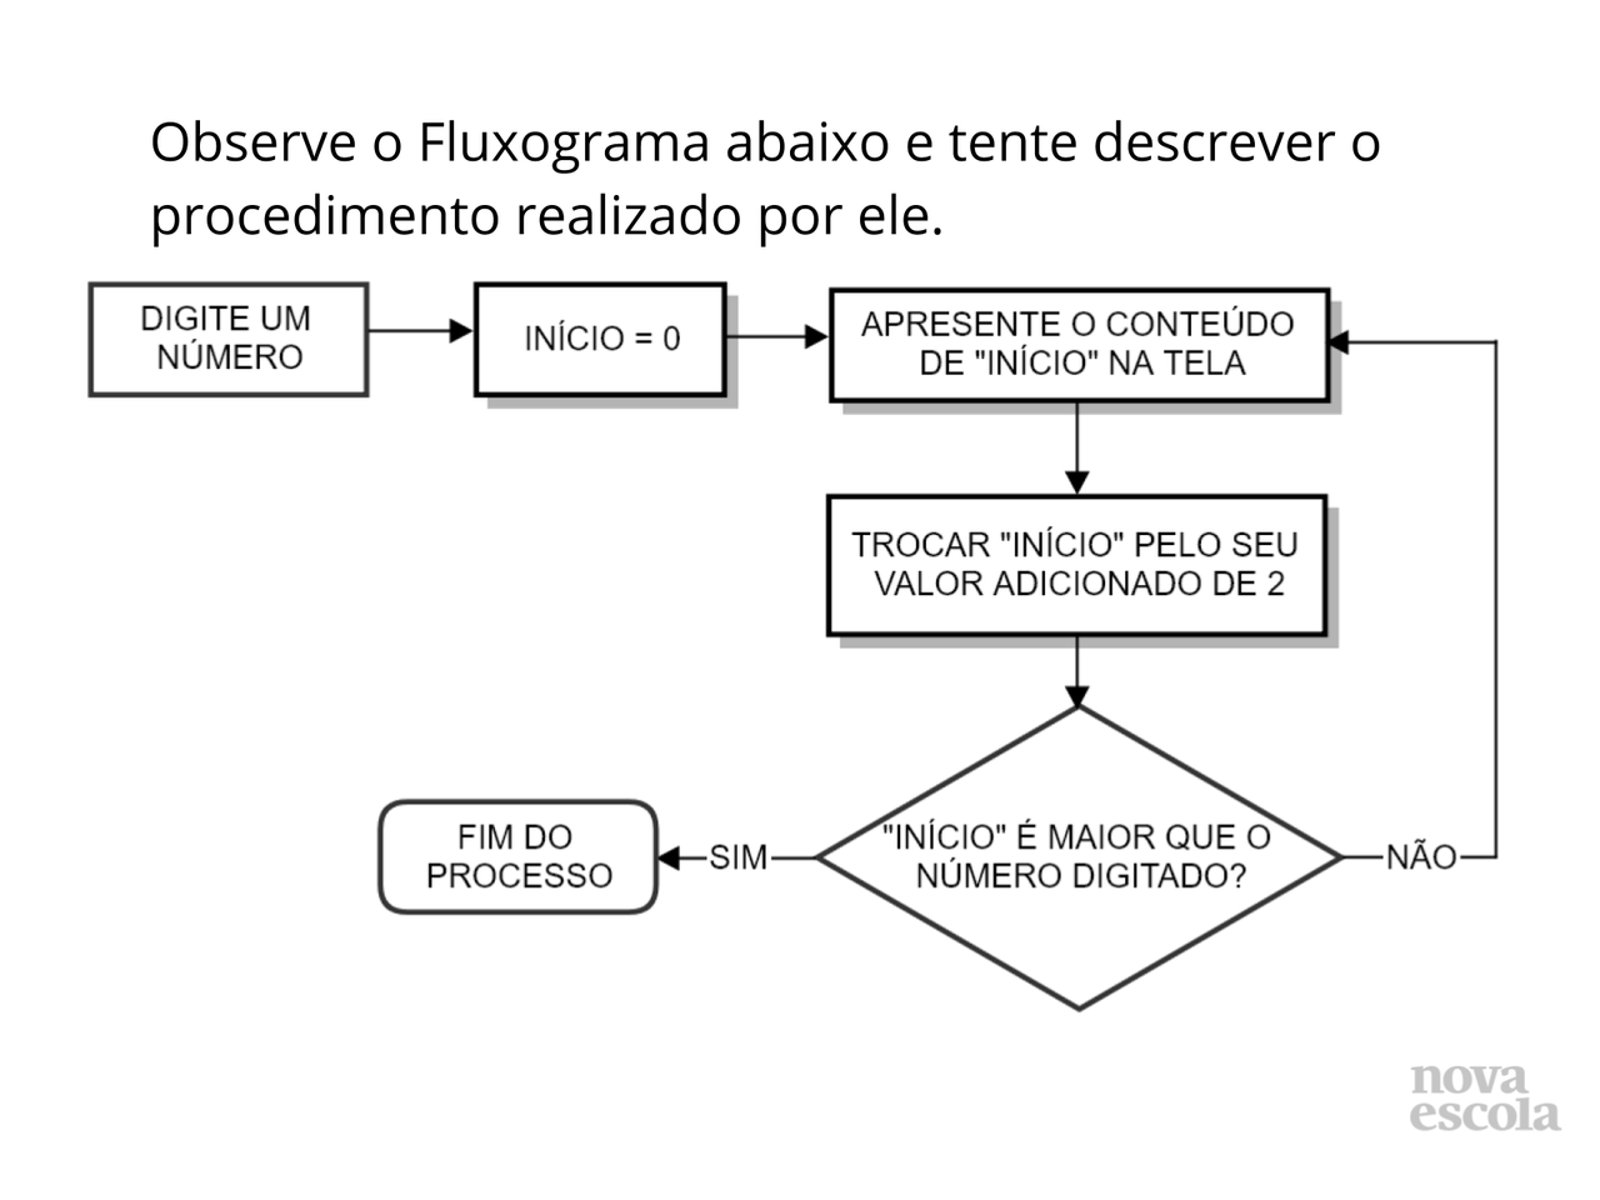 Conhecendo diferentes estruturas aplicadas aos Fluxogramas